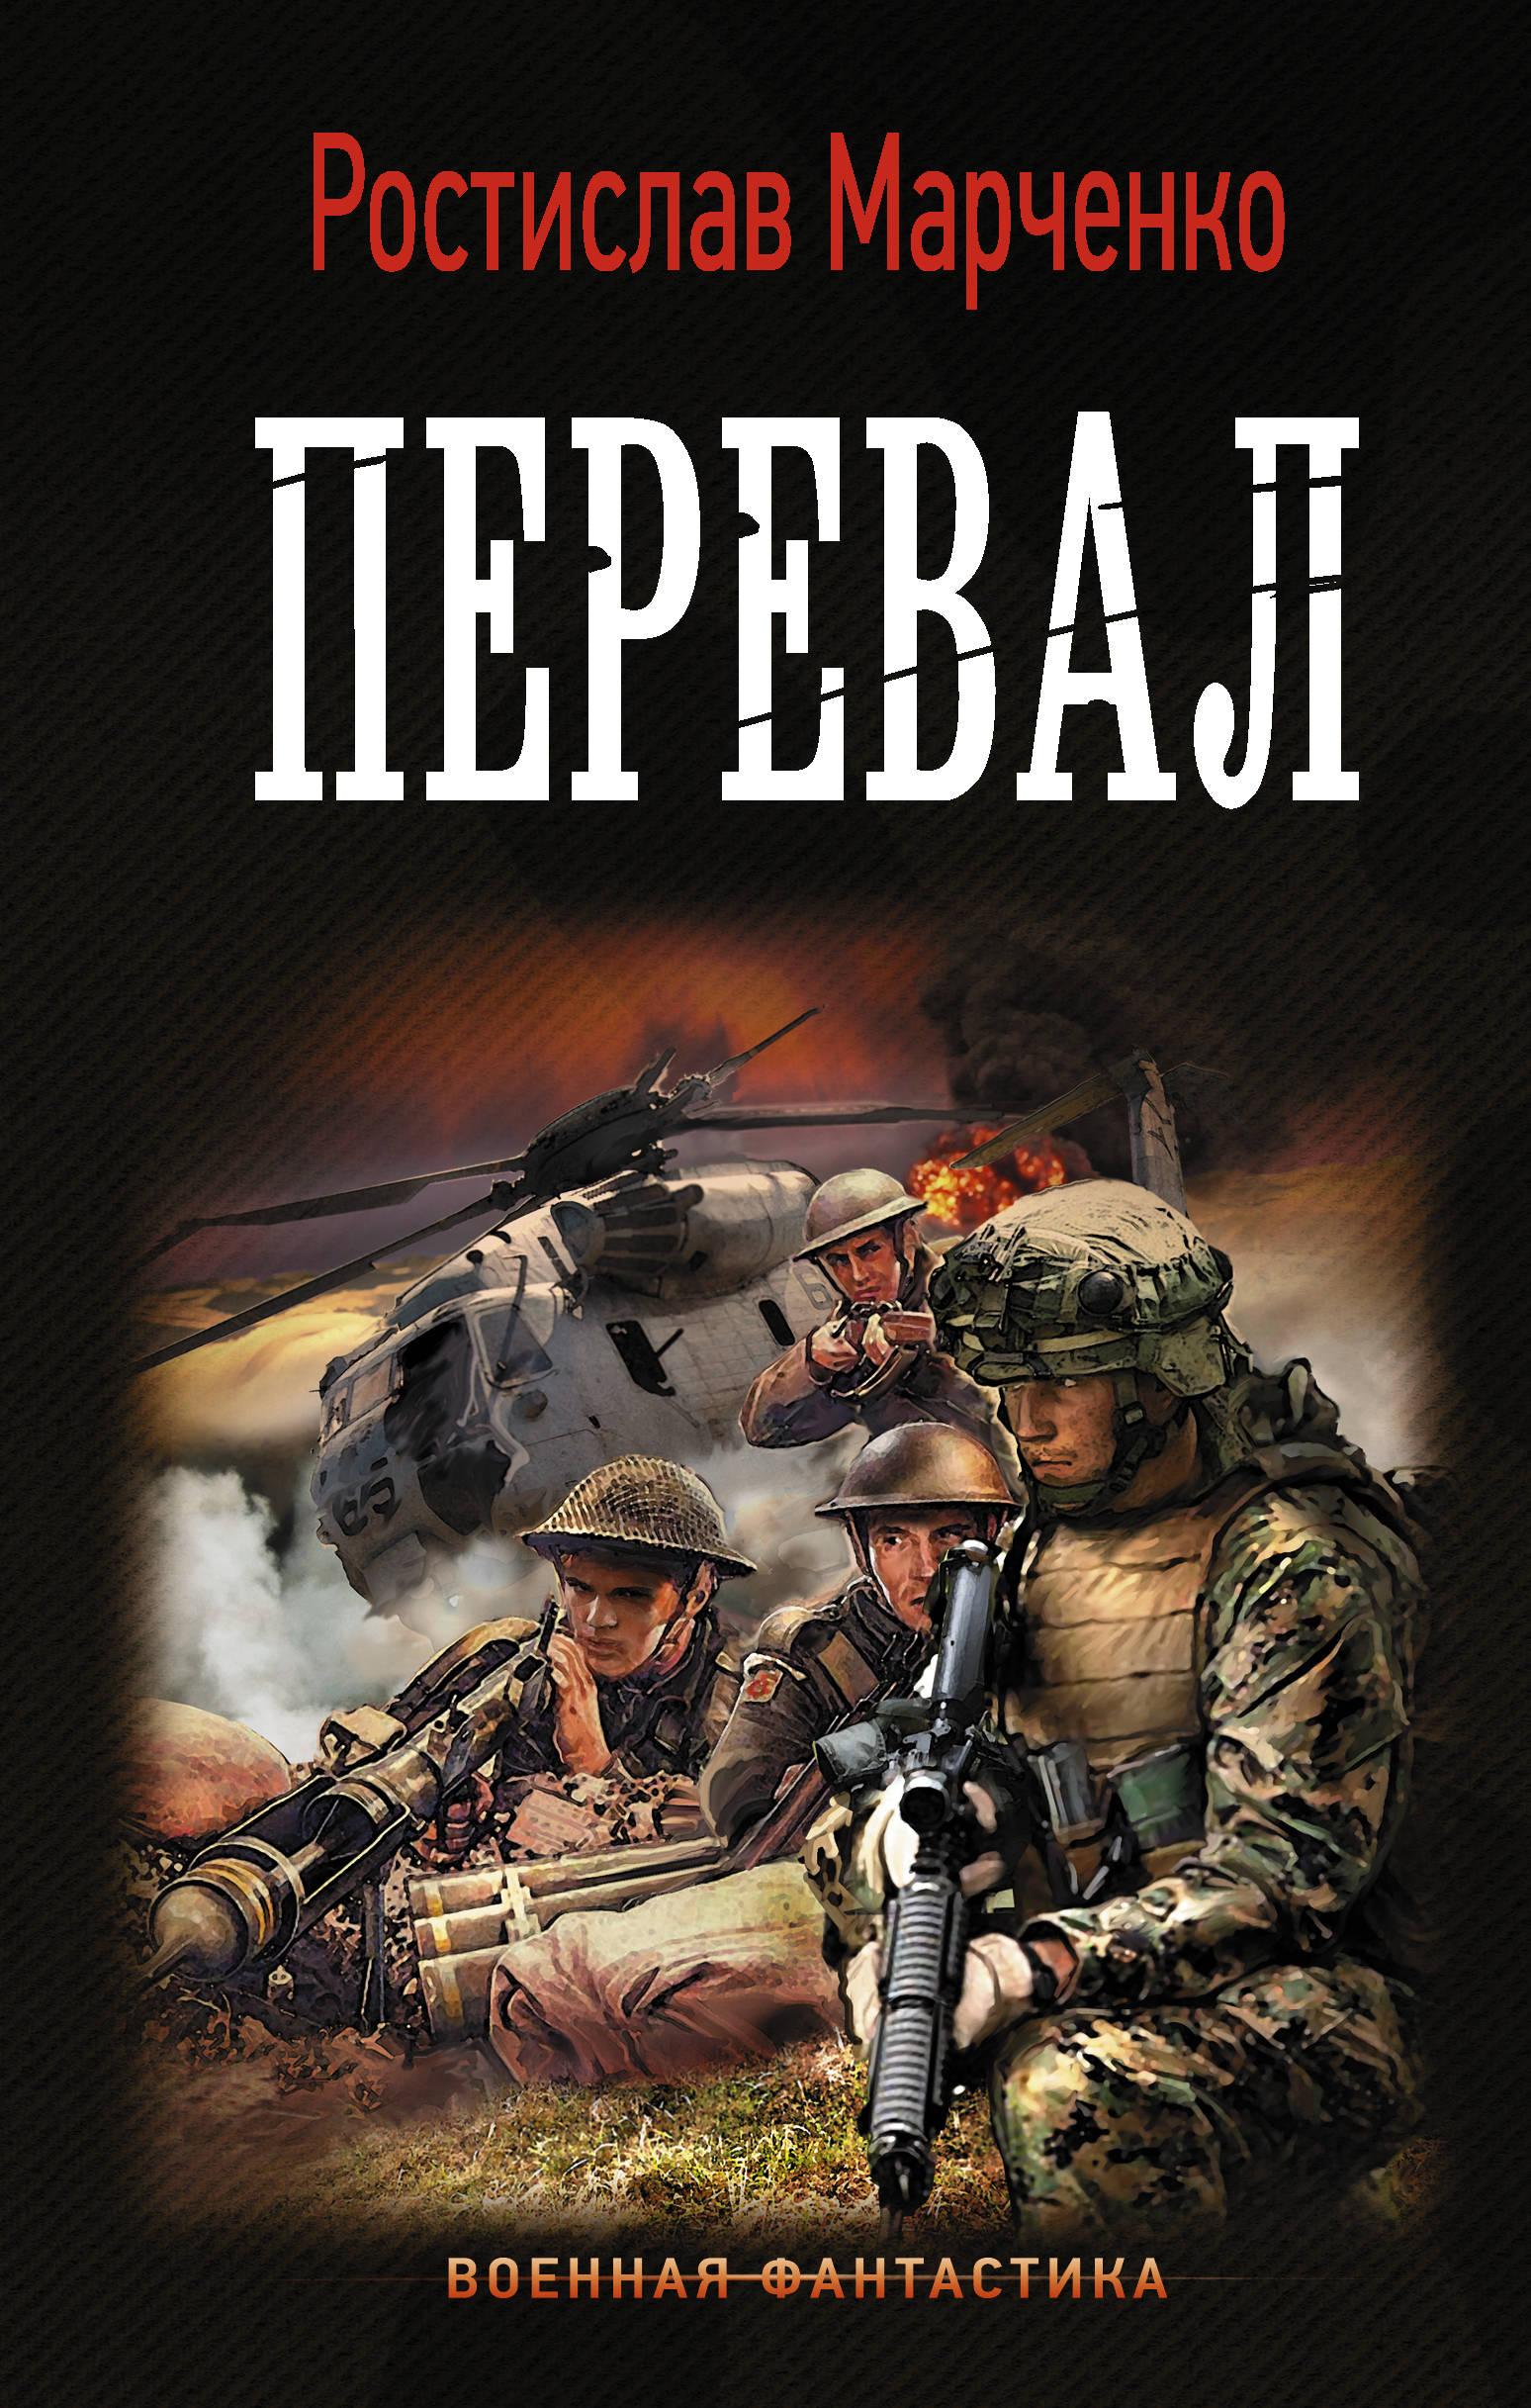 Ростислав Марченко «Перевал»